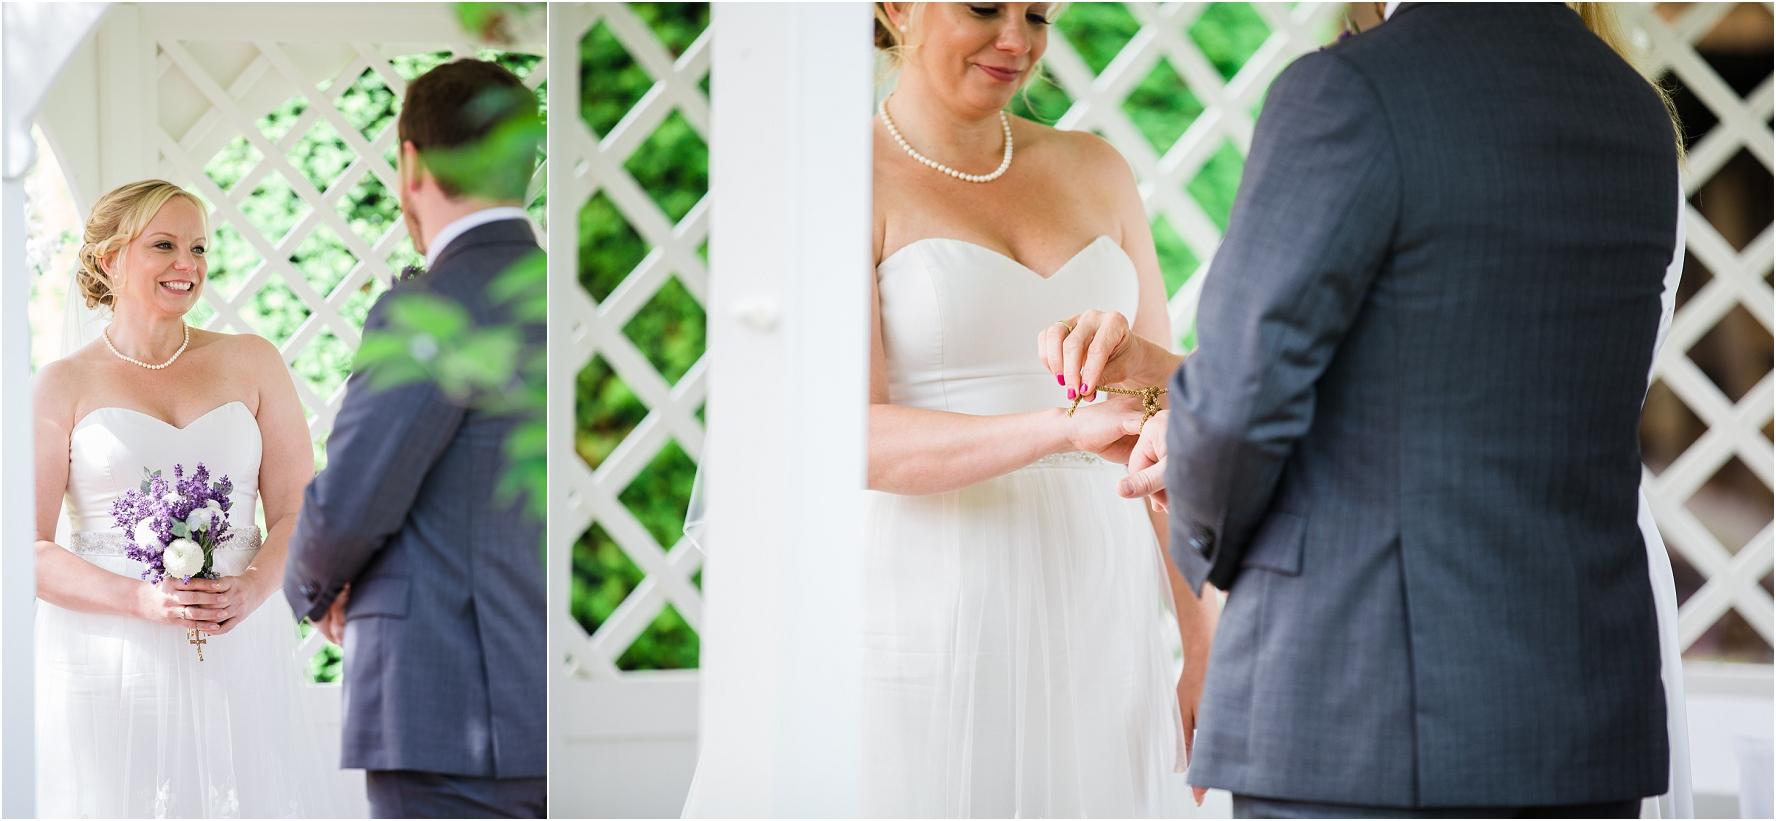 wedding-photography-the-orangery-settringham_0436